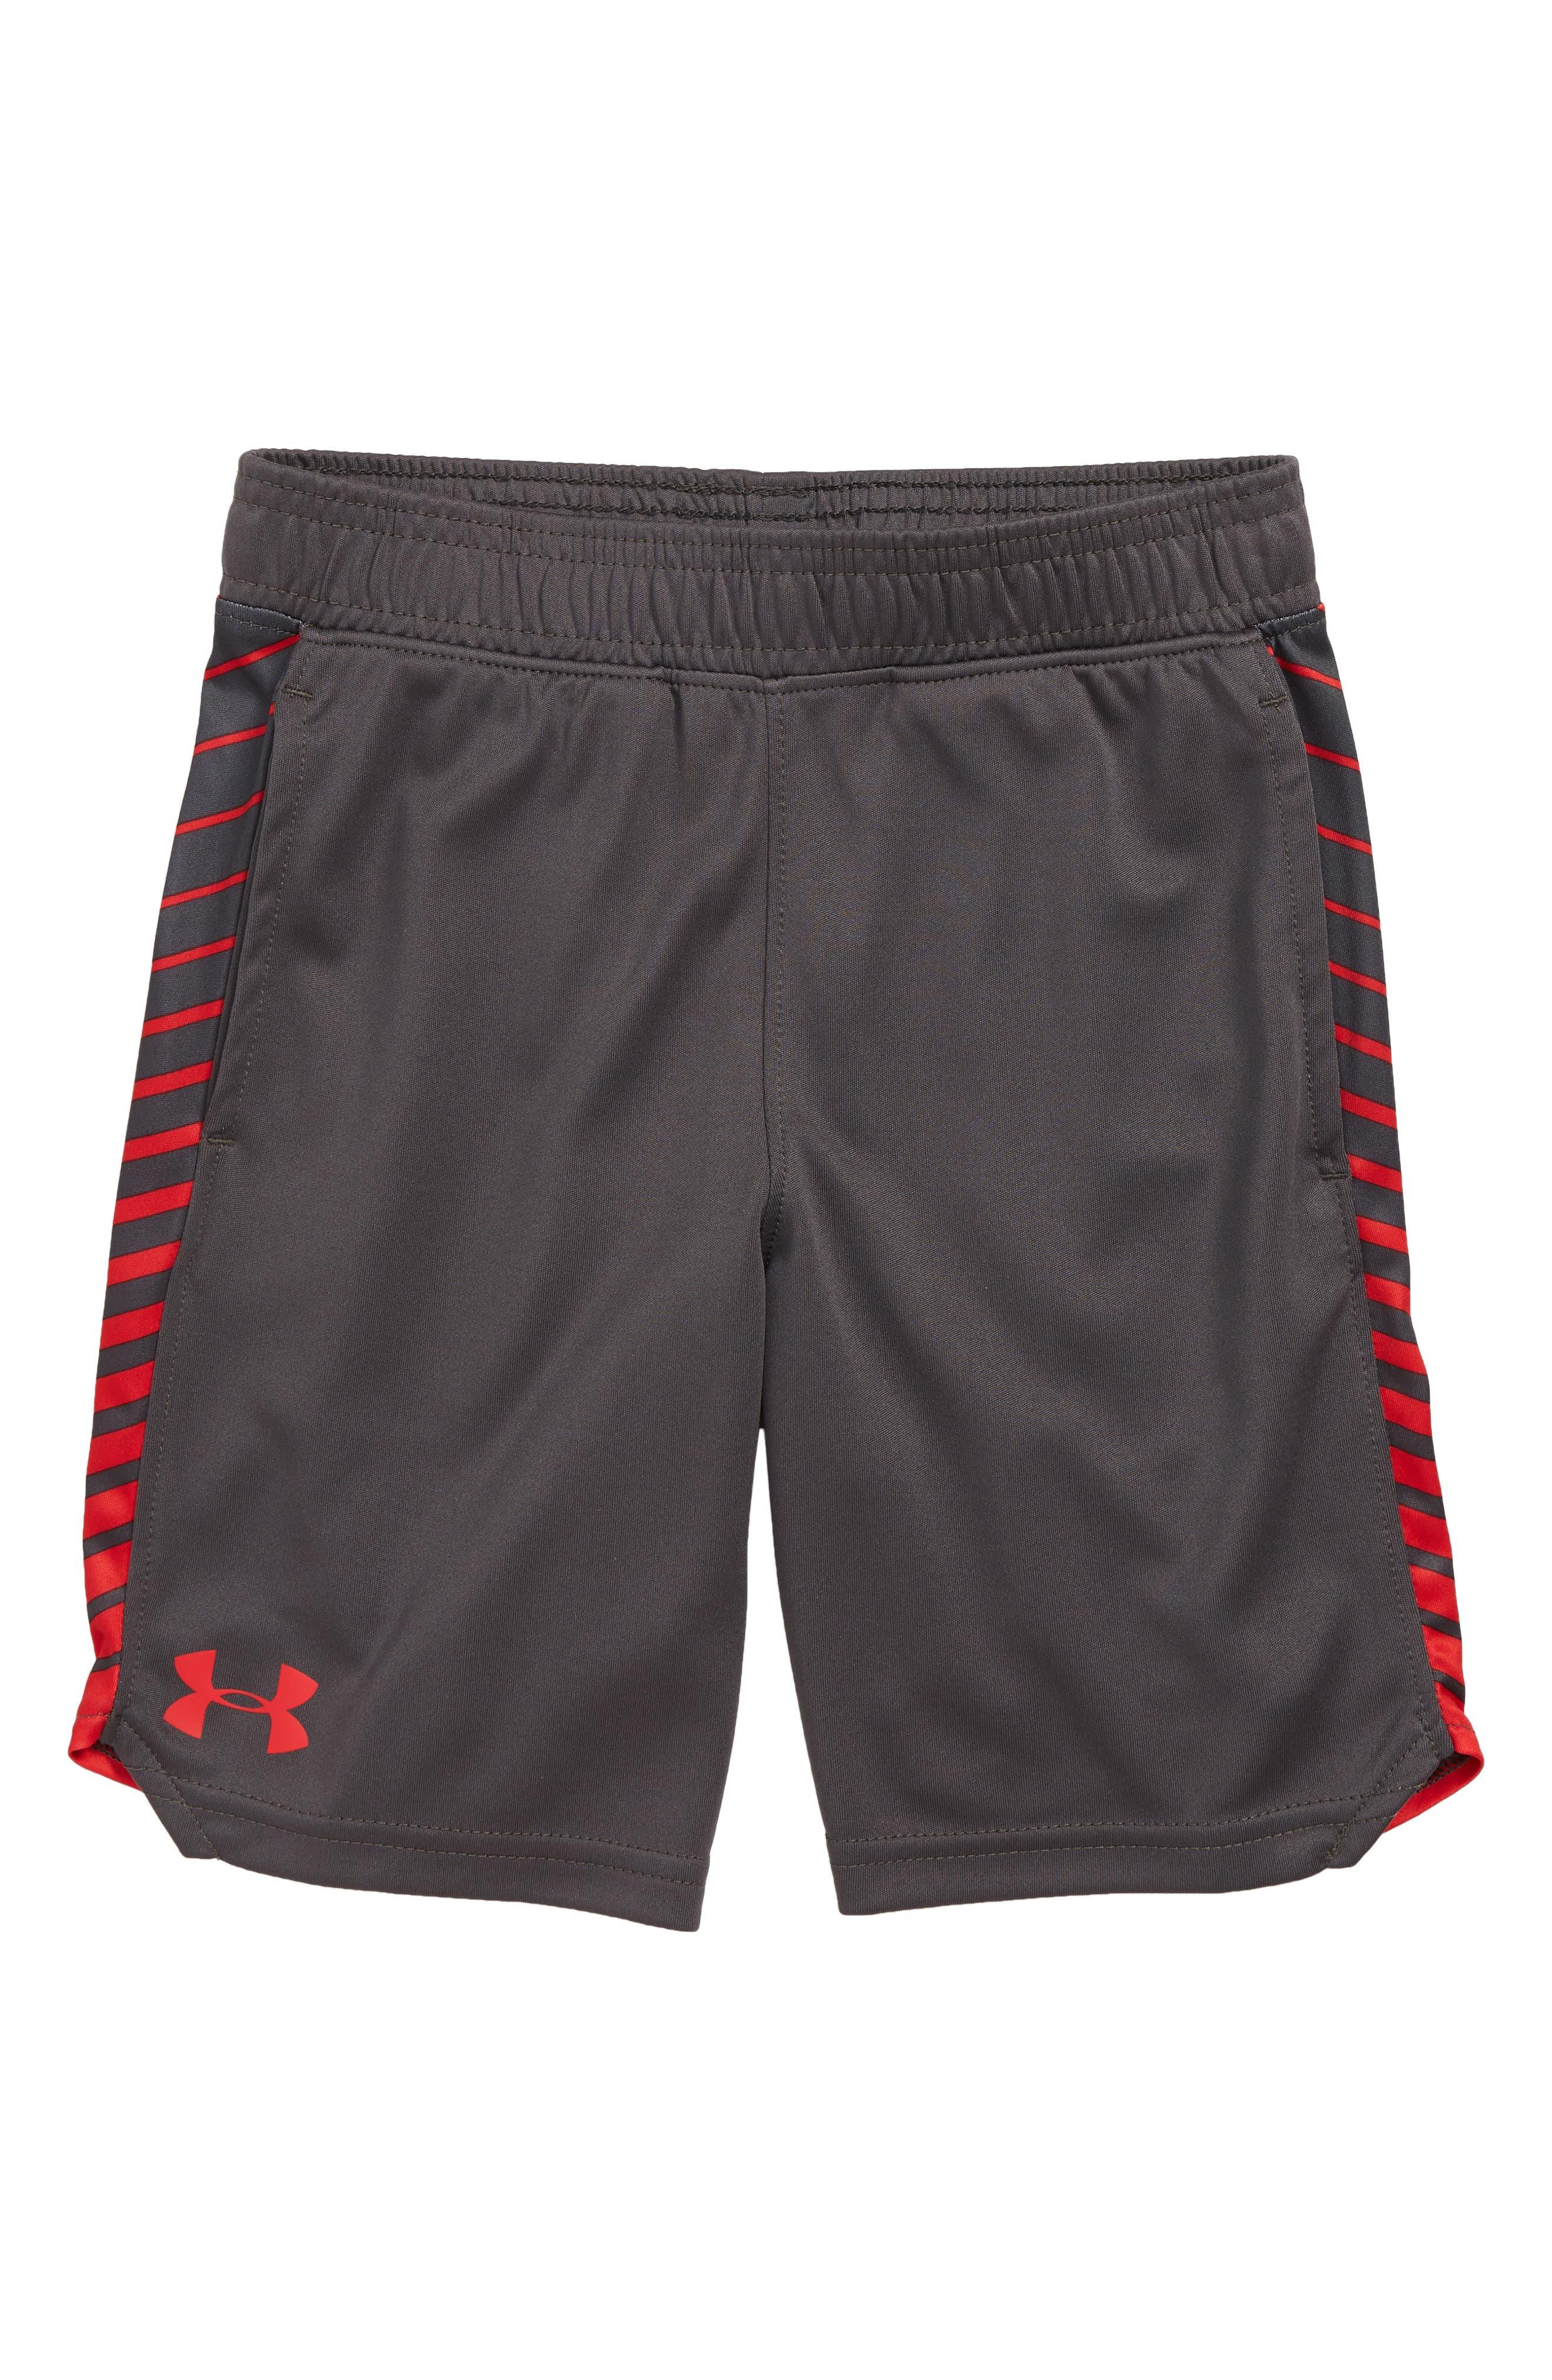 UNDER ARMOUR, Half Back HeatGear<sup>®</sup> Shorts, Main thumbnail 1, color, JET GRAY